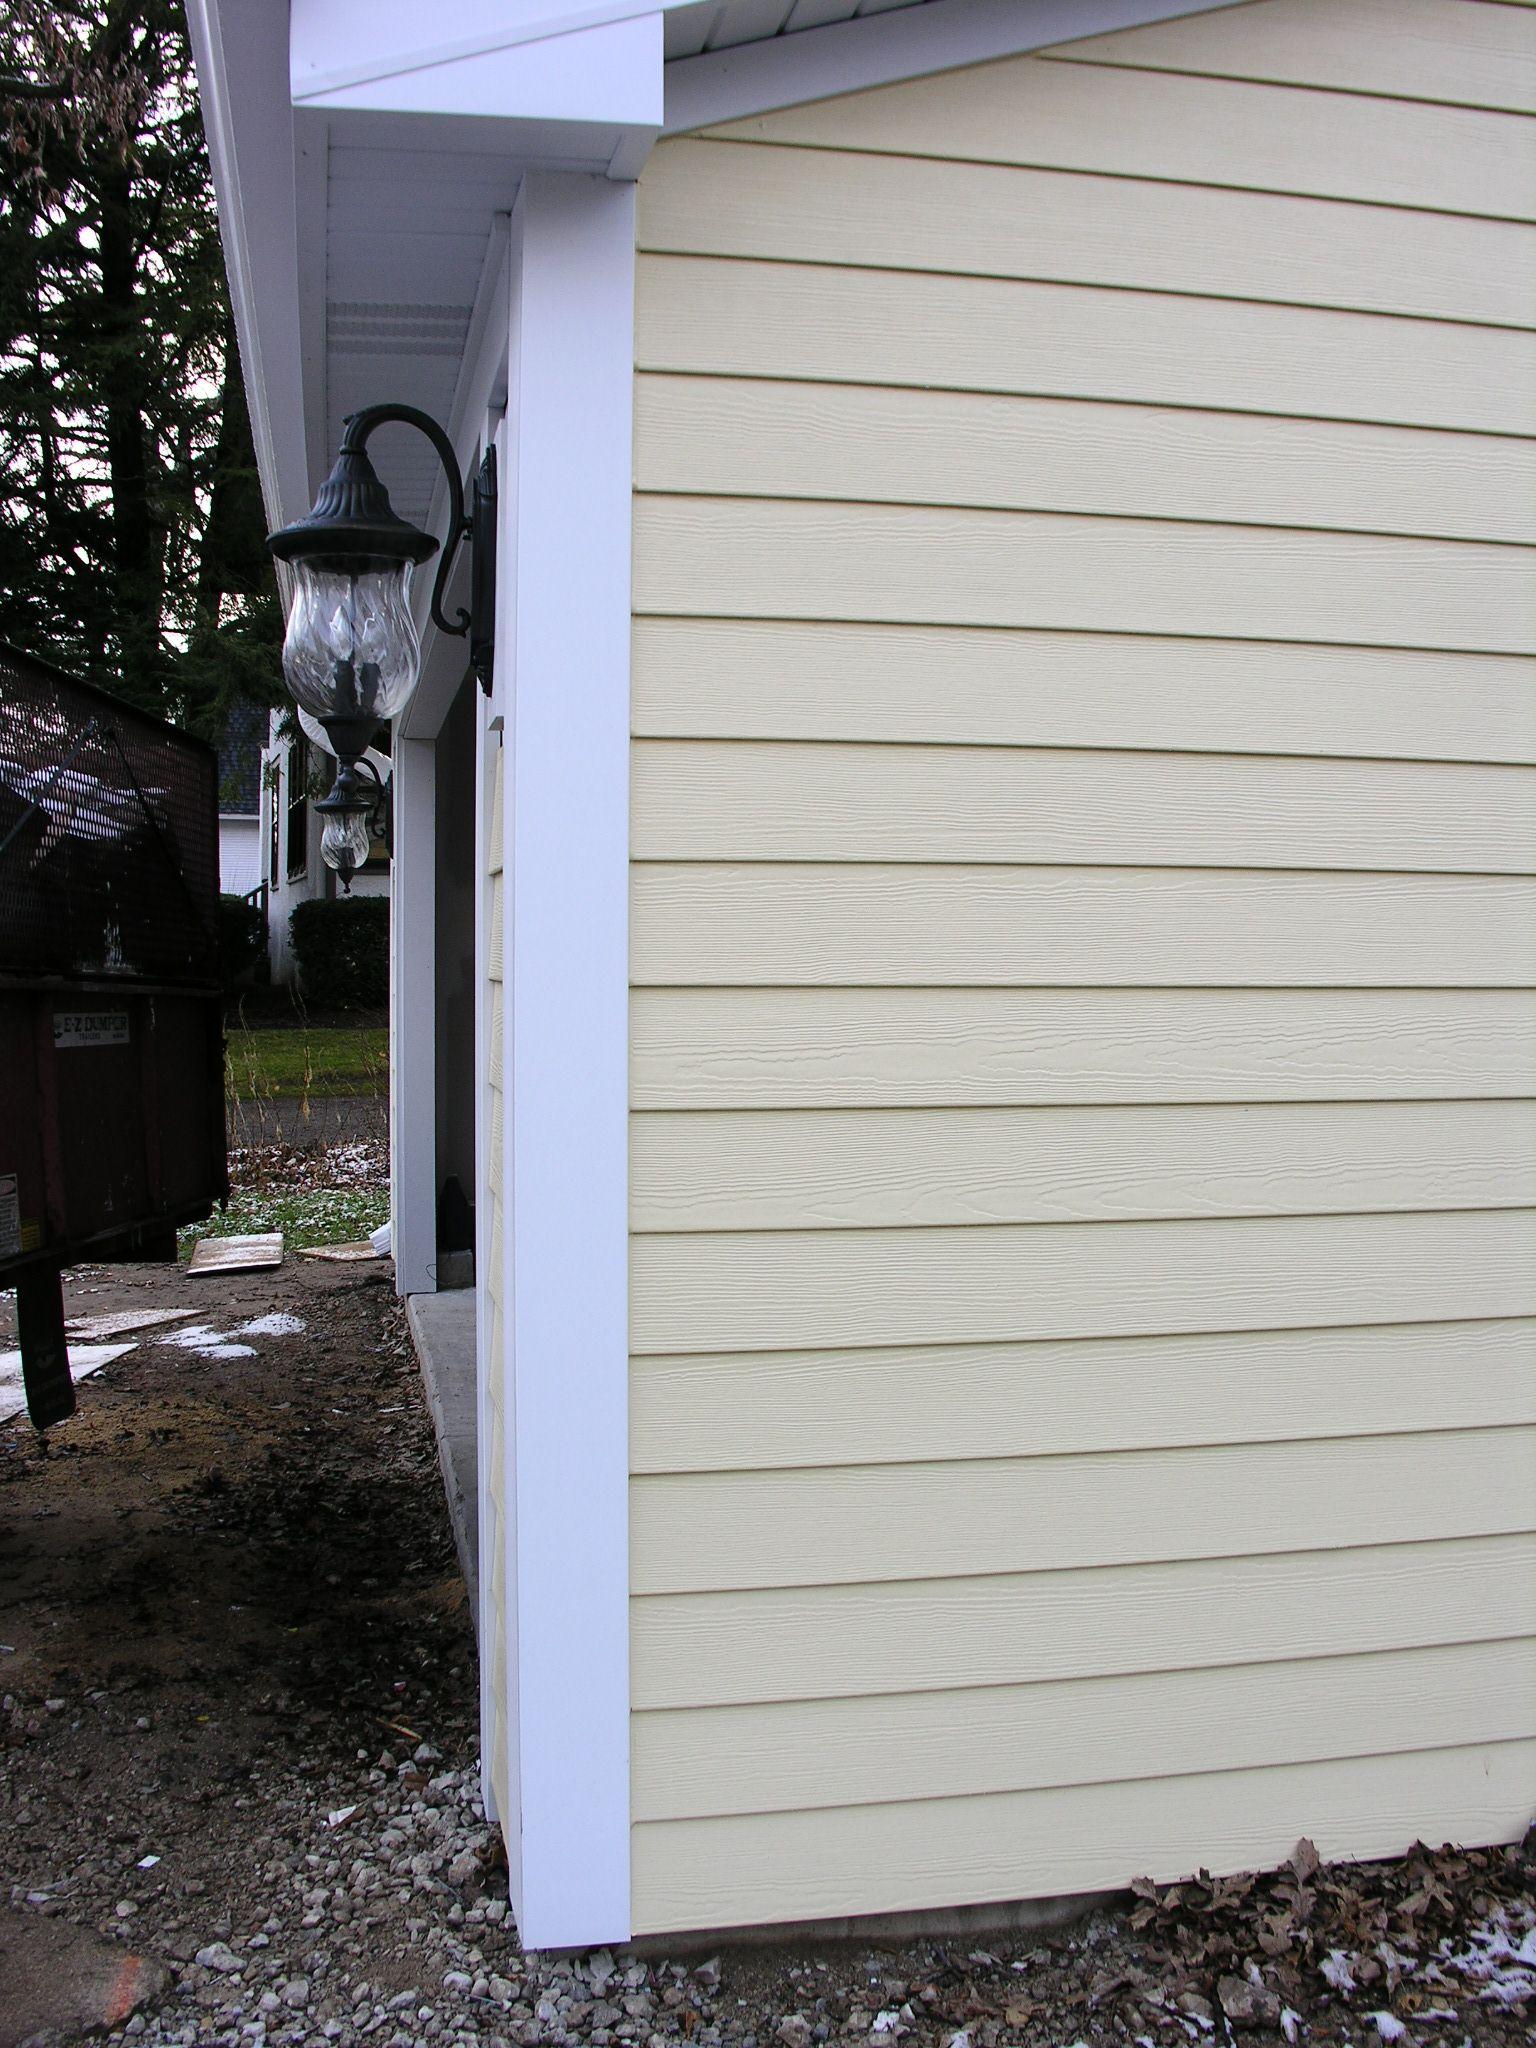 Colorplus Woodland Cream 6 Cedarmill Plank Siding Fiber Cement Siding Siding Curb Appeal